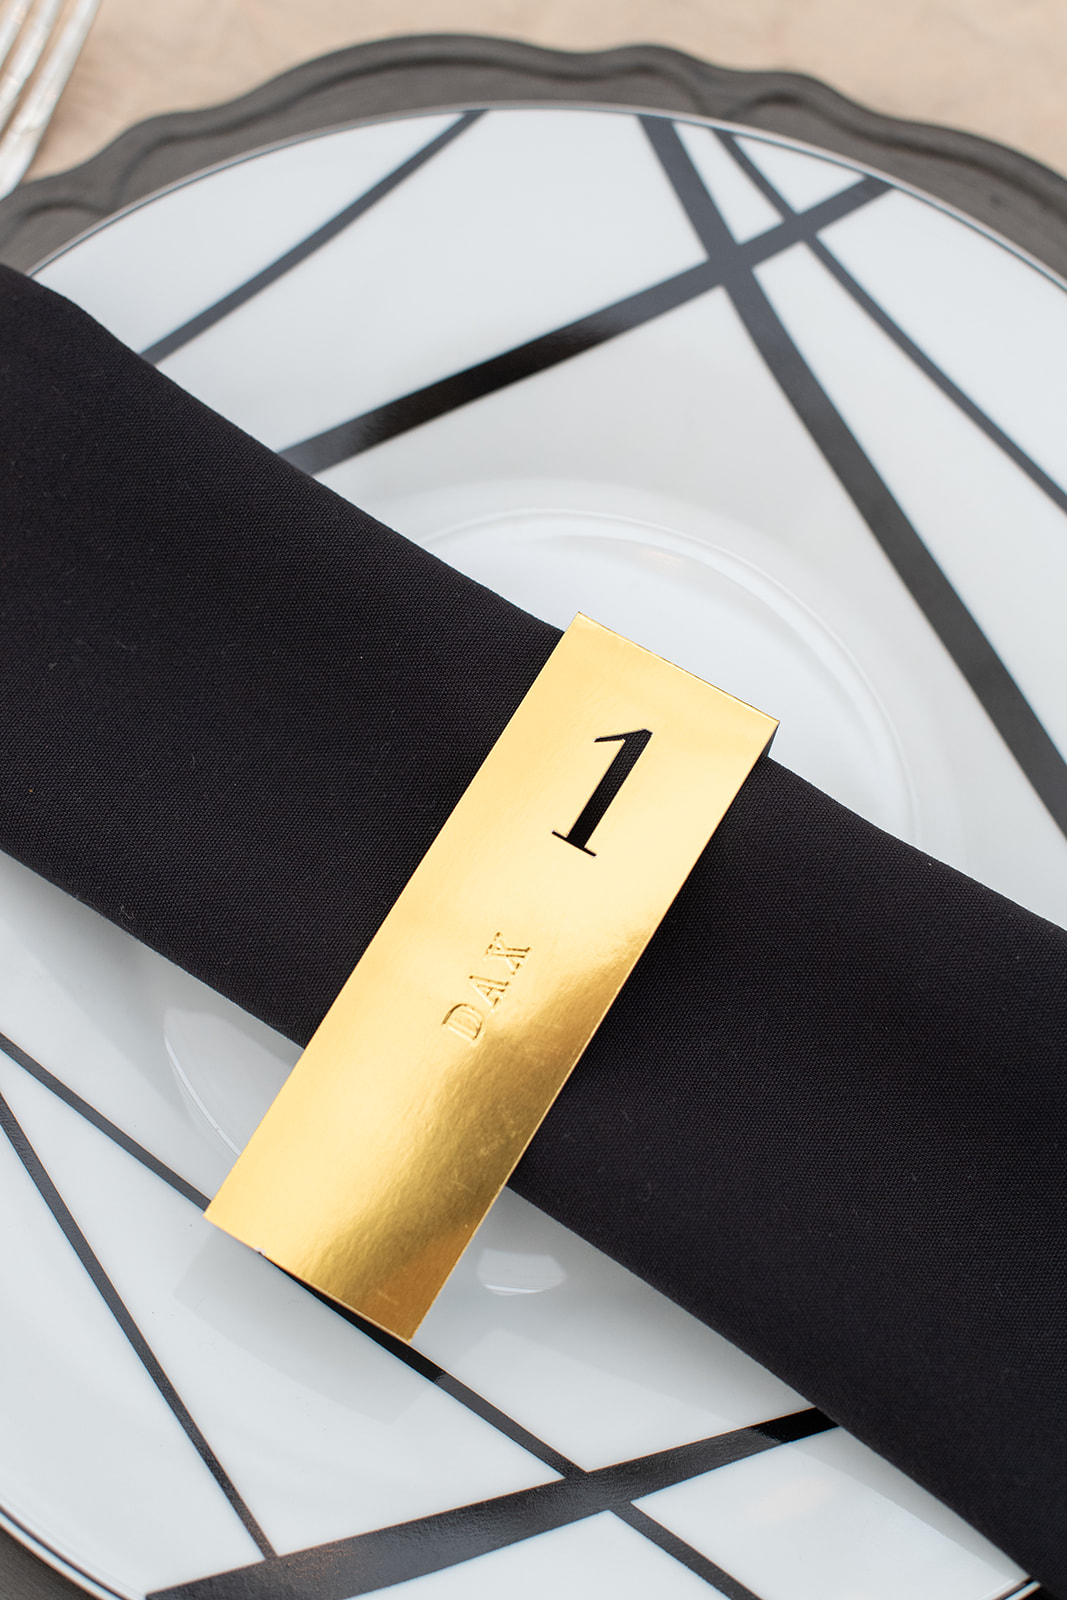 Black and gold wedding escort card design